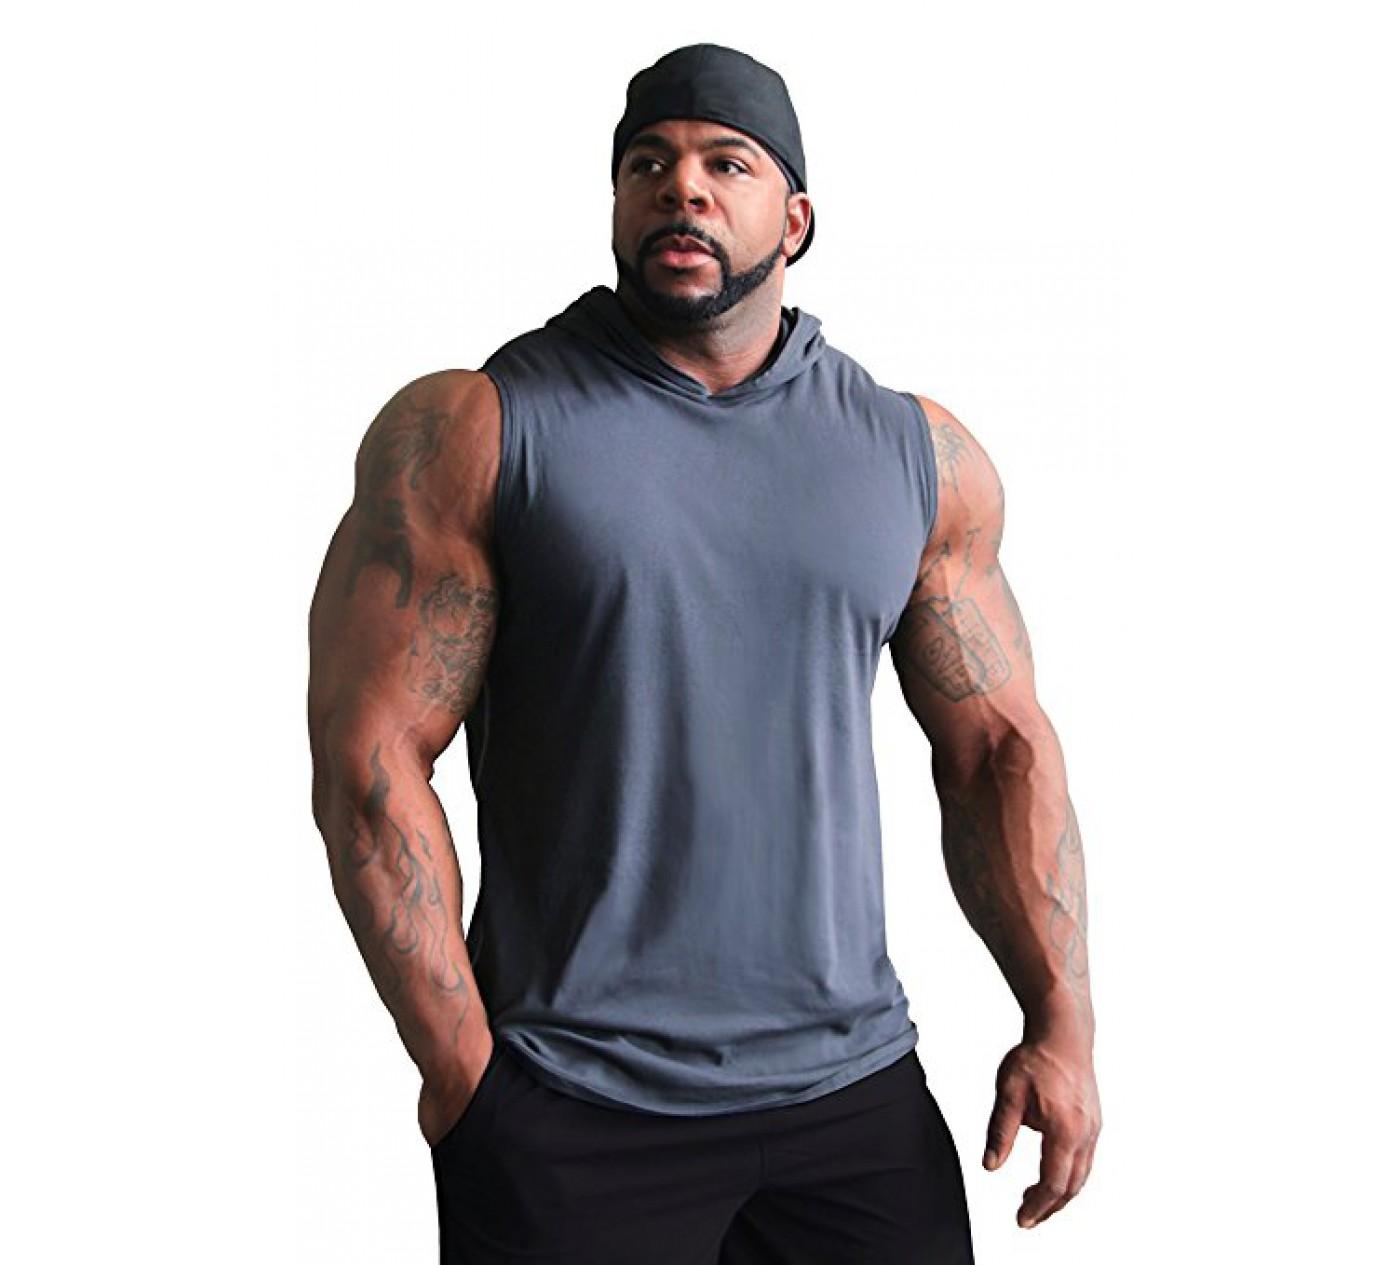 C444 Crazy Wear Muscle Topp 3/4 Sleeve